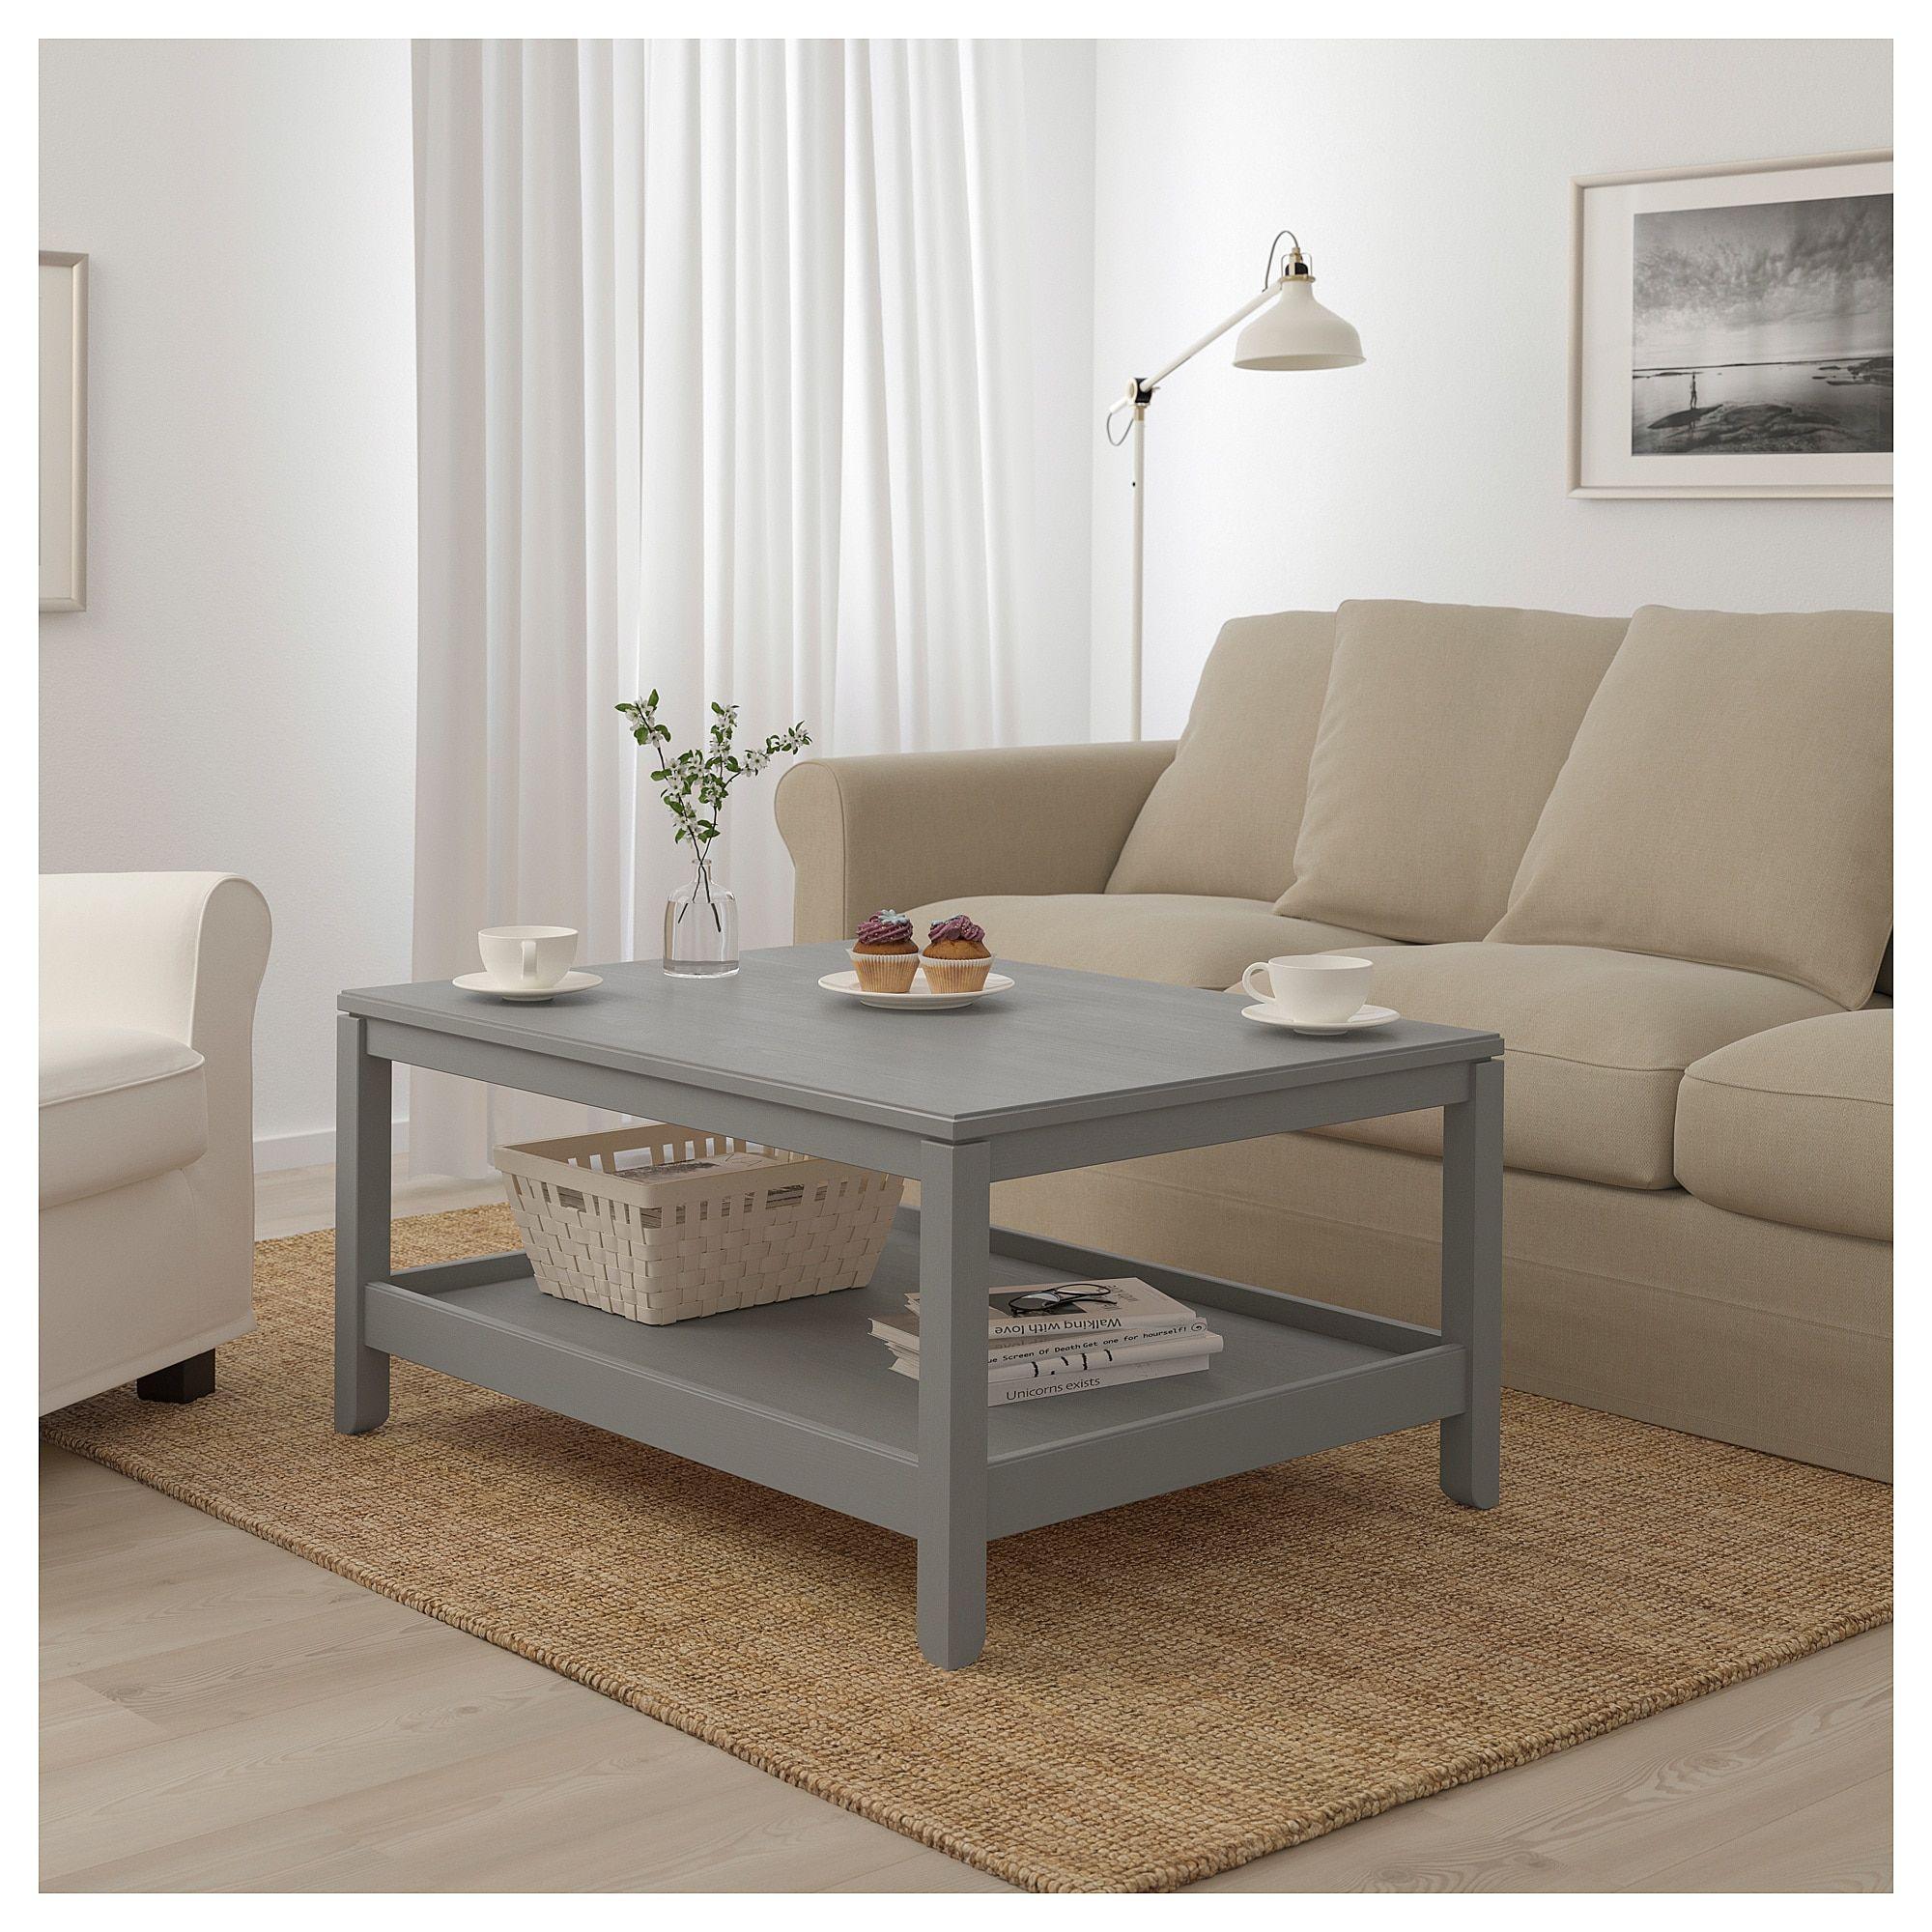 IKEA HAVSTA Coffee table gray Ikea coffee table